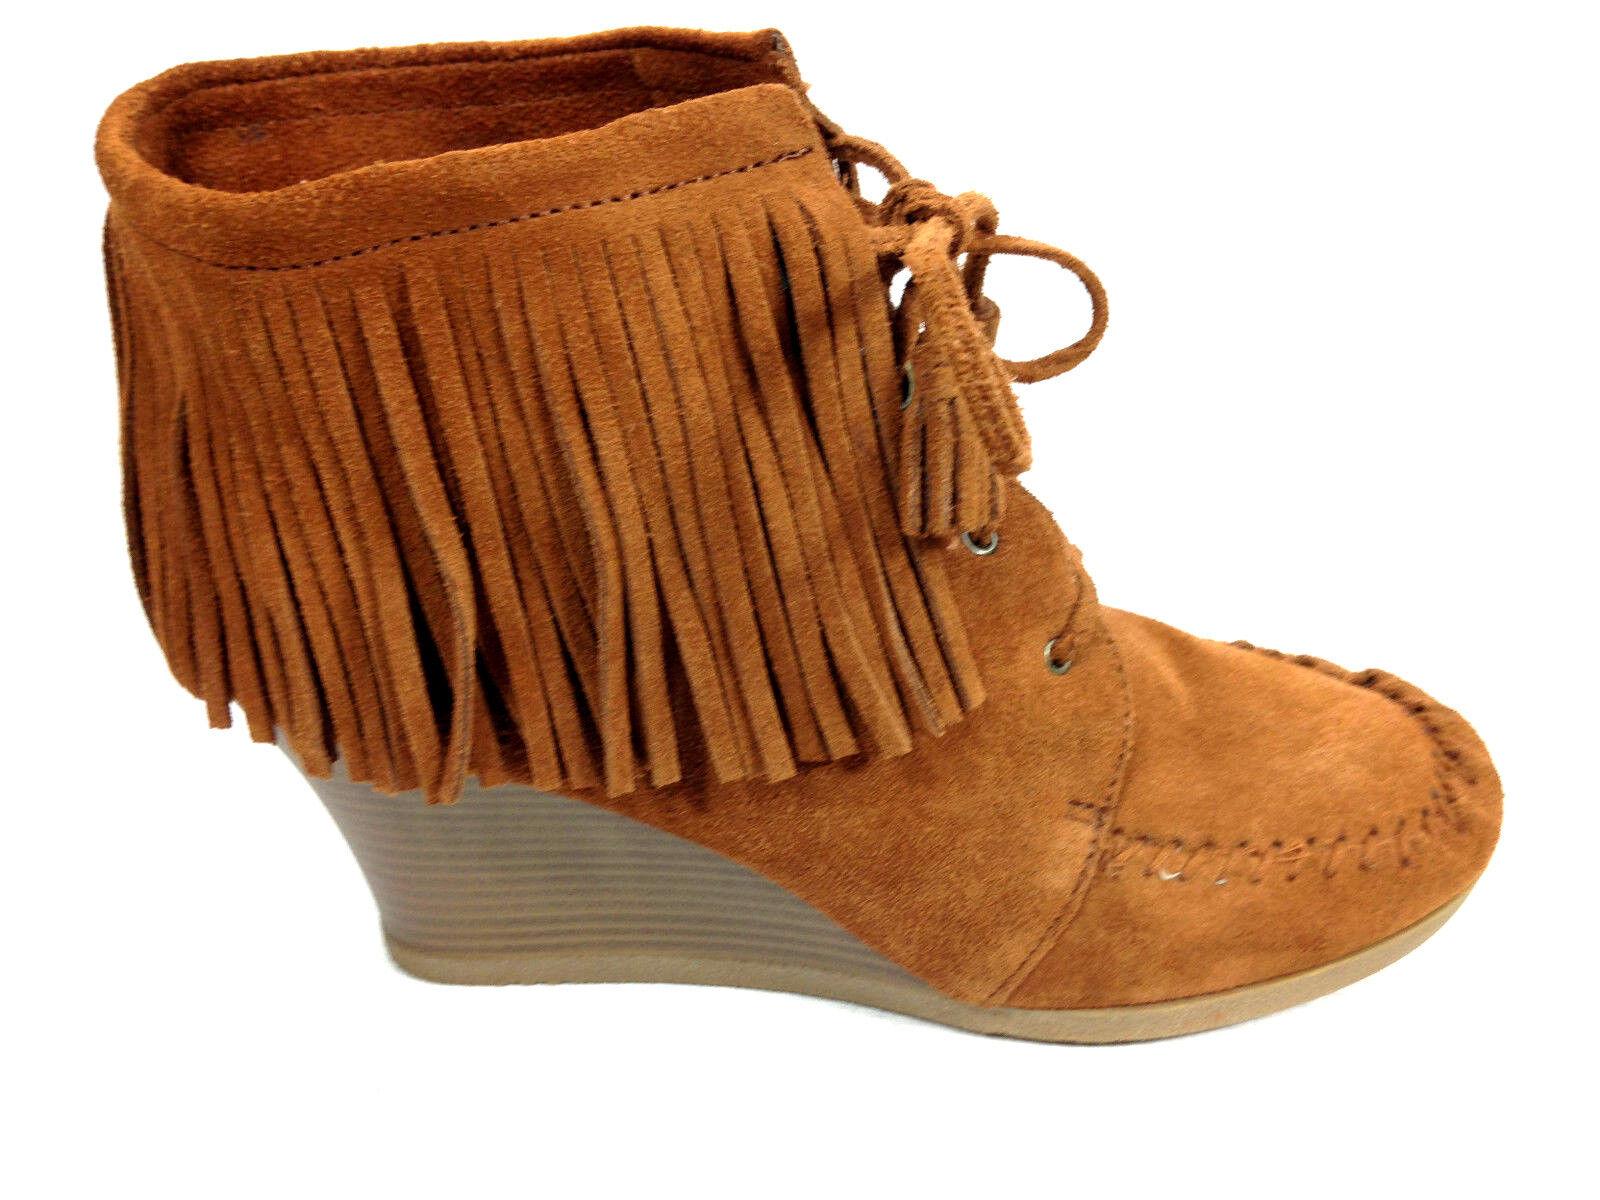 Minnetonka Fringe  Wedge Heel Mocassin 84022 Size 10 US.